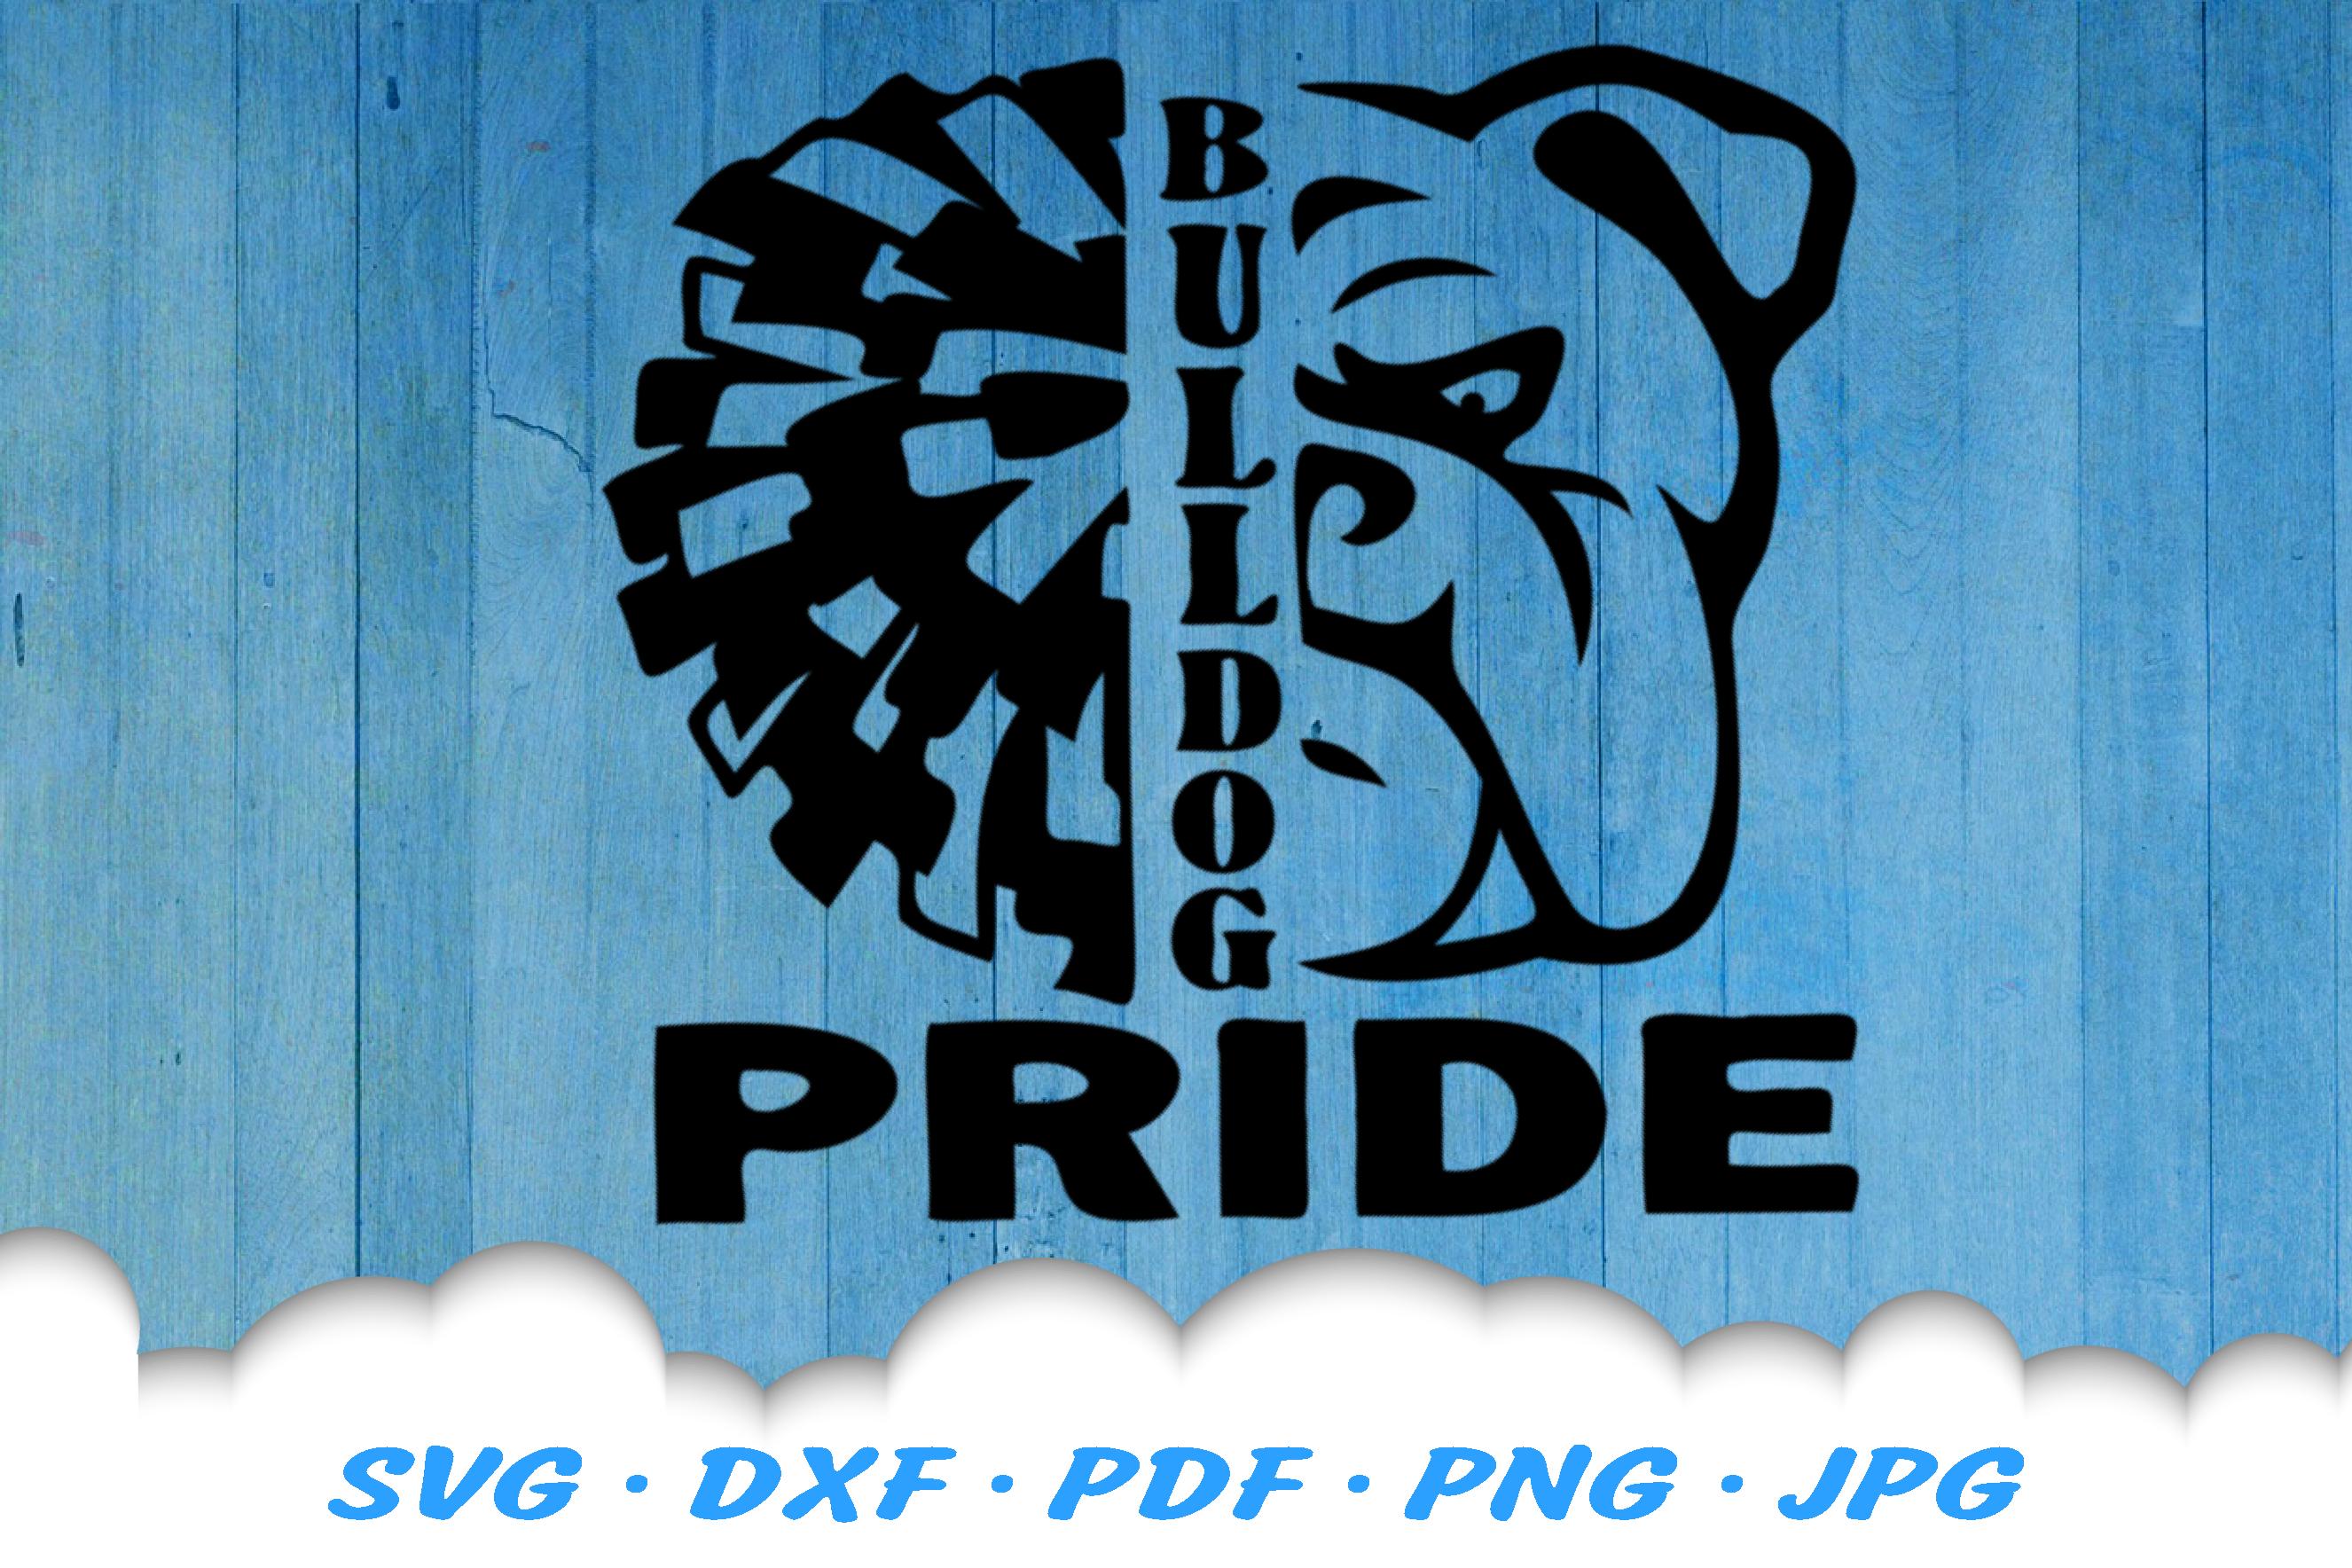 Bulldog Pride Mascot Cheer Pom SVG DXF Cut Files example image 2